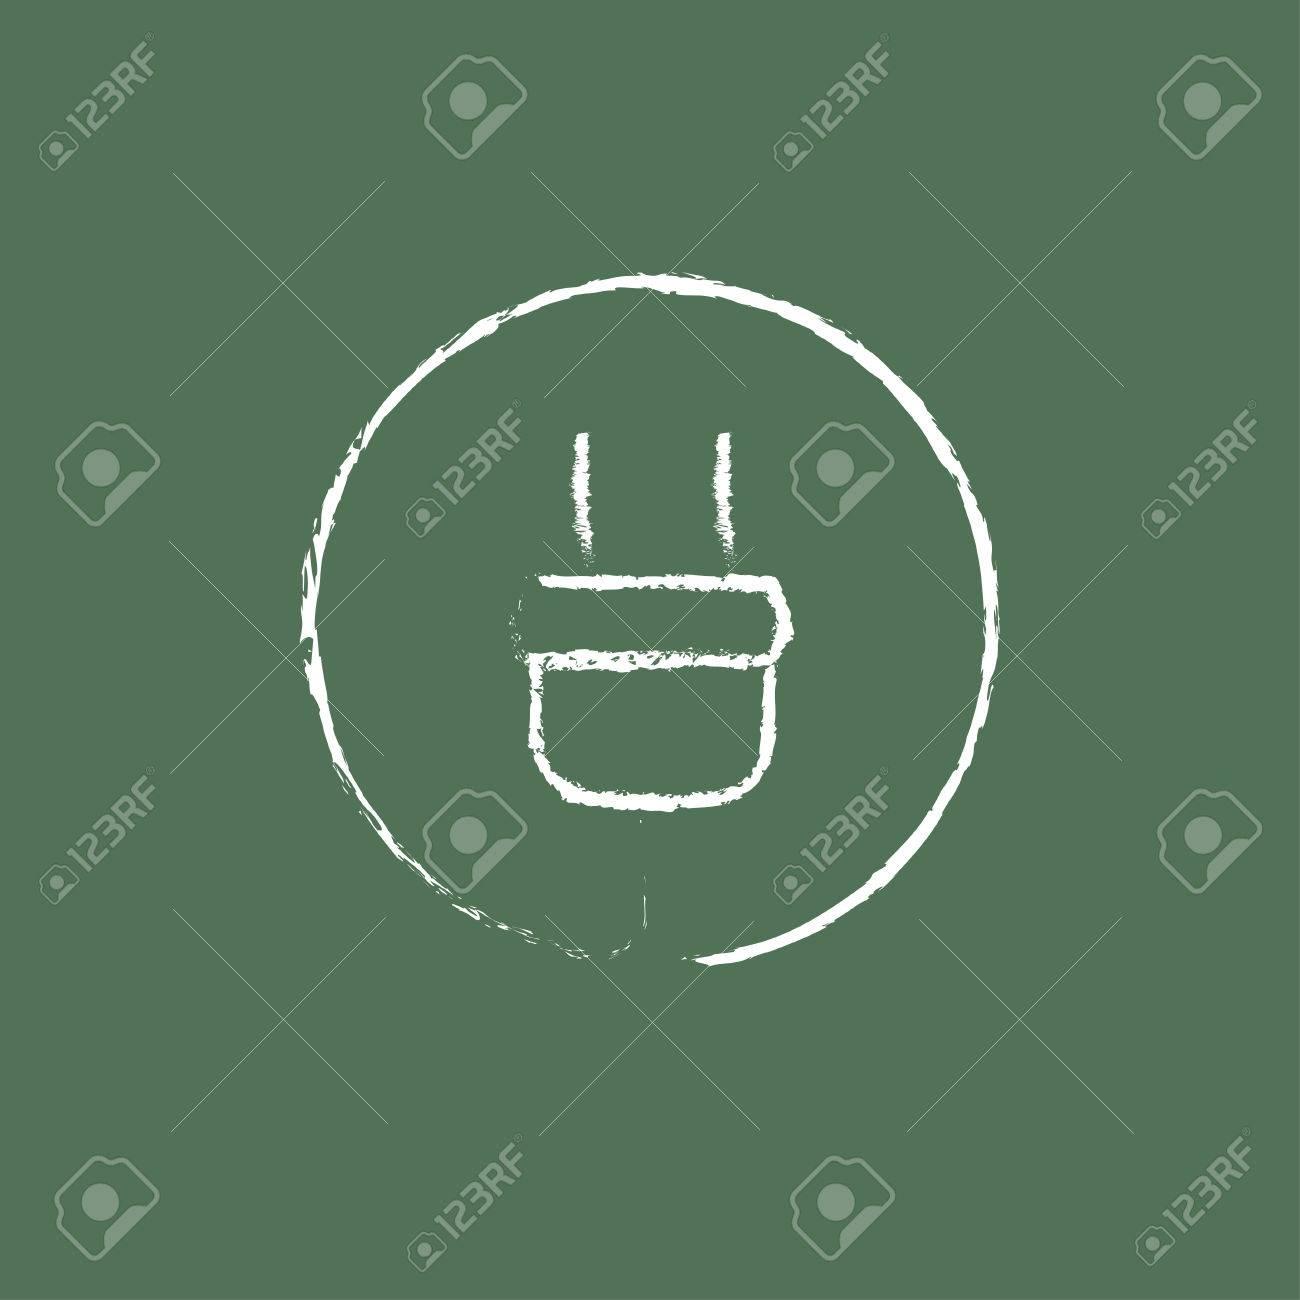 Nett Elektrische Standardsymbole Ideen - Schaltplan Serie Circuit ...